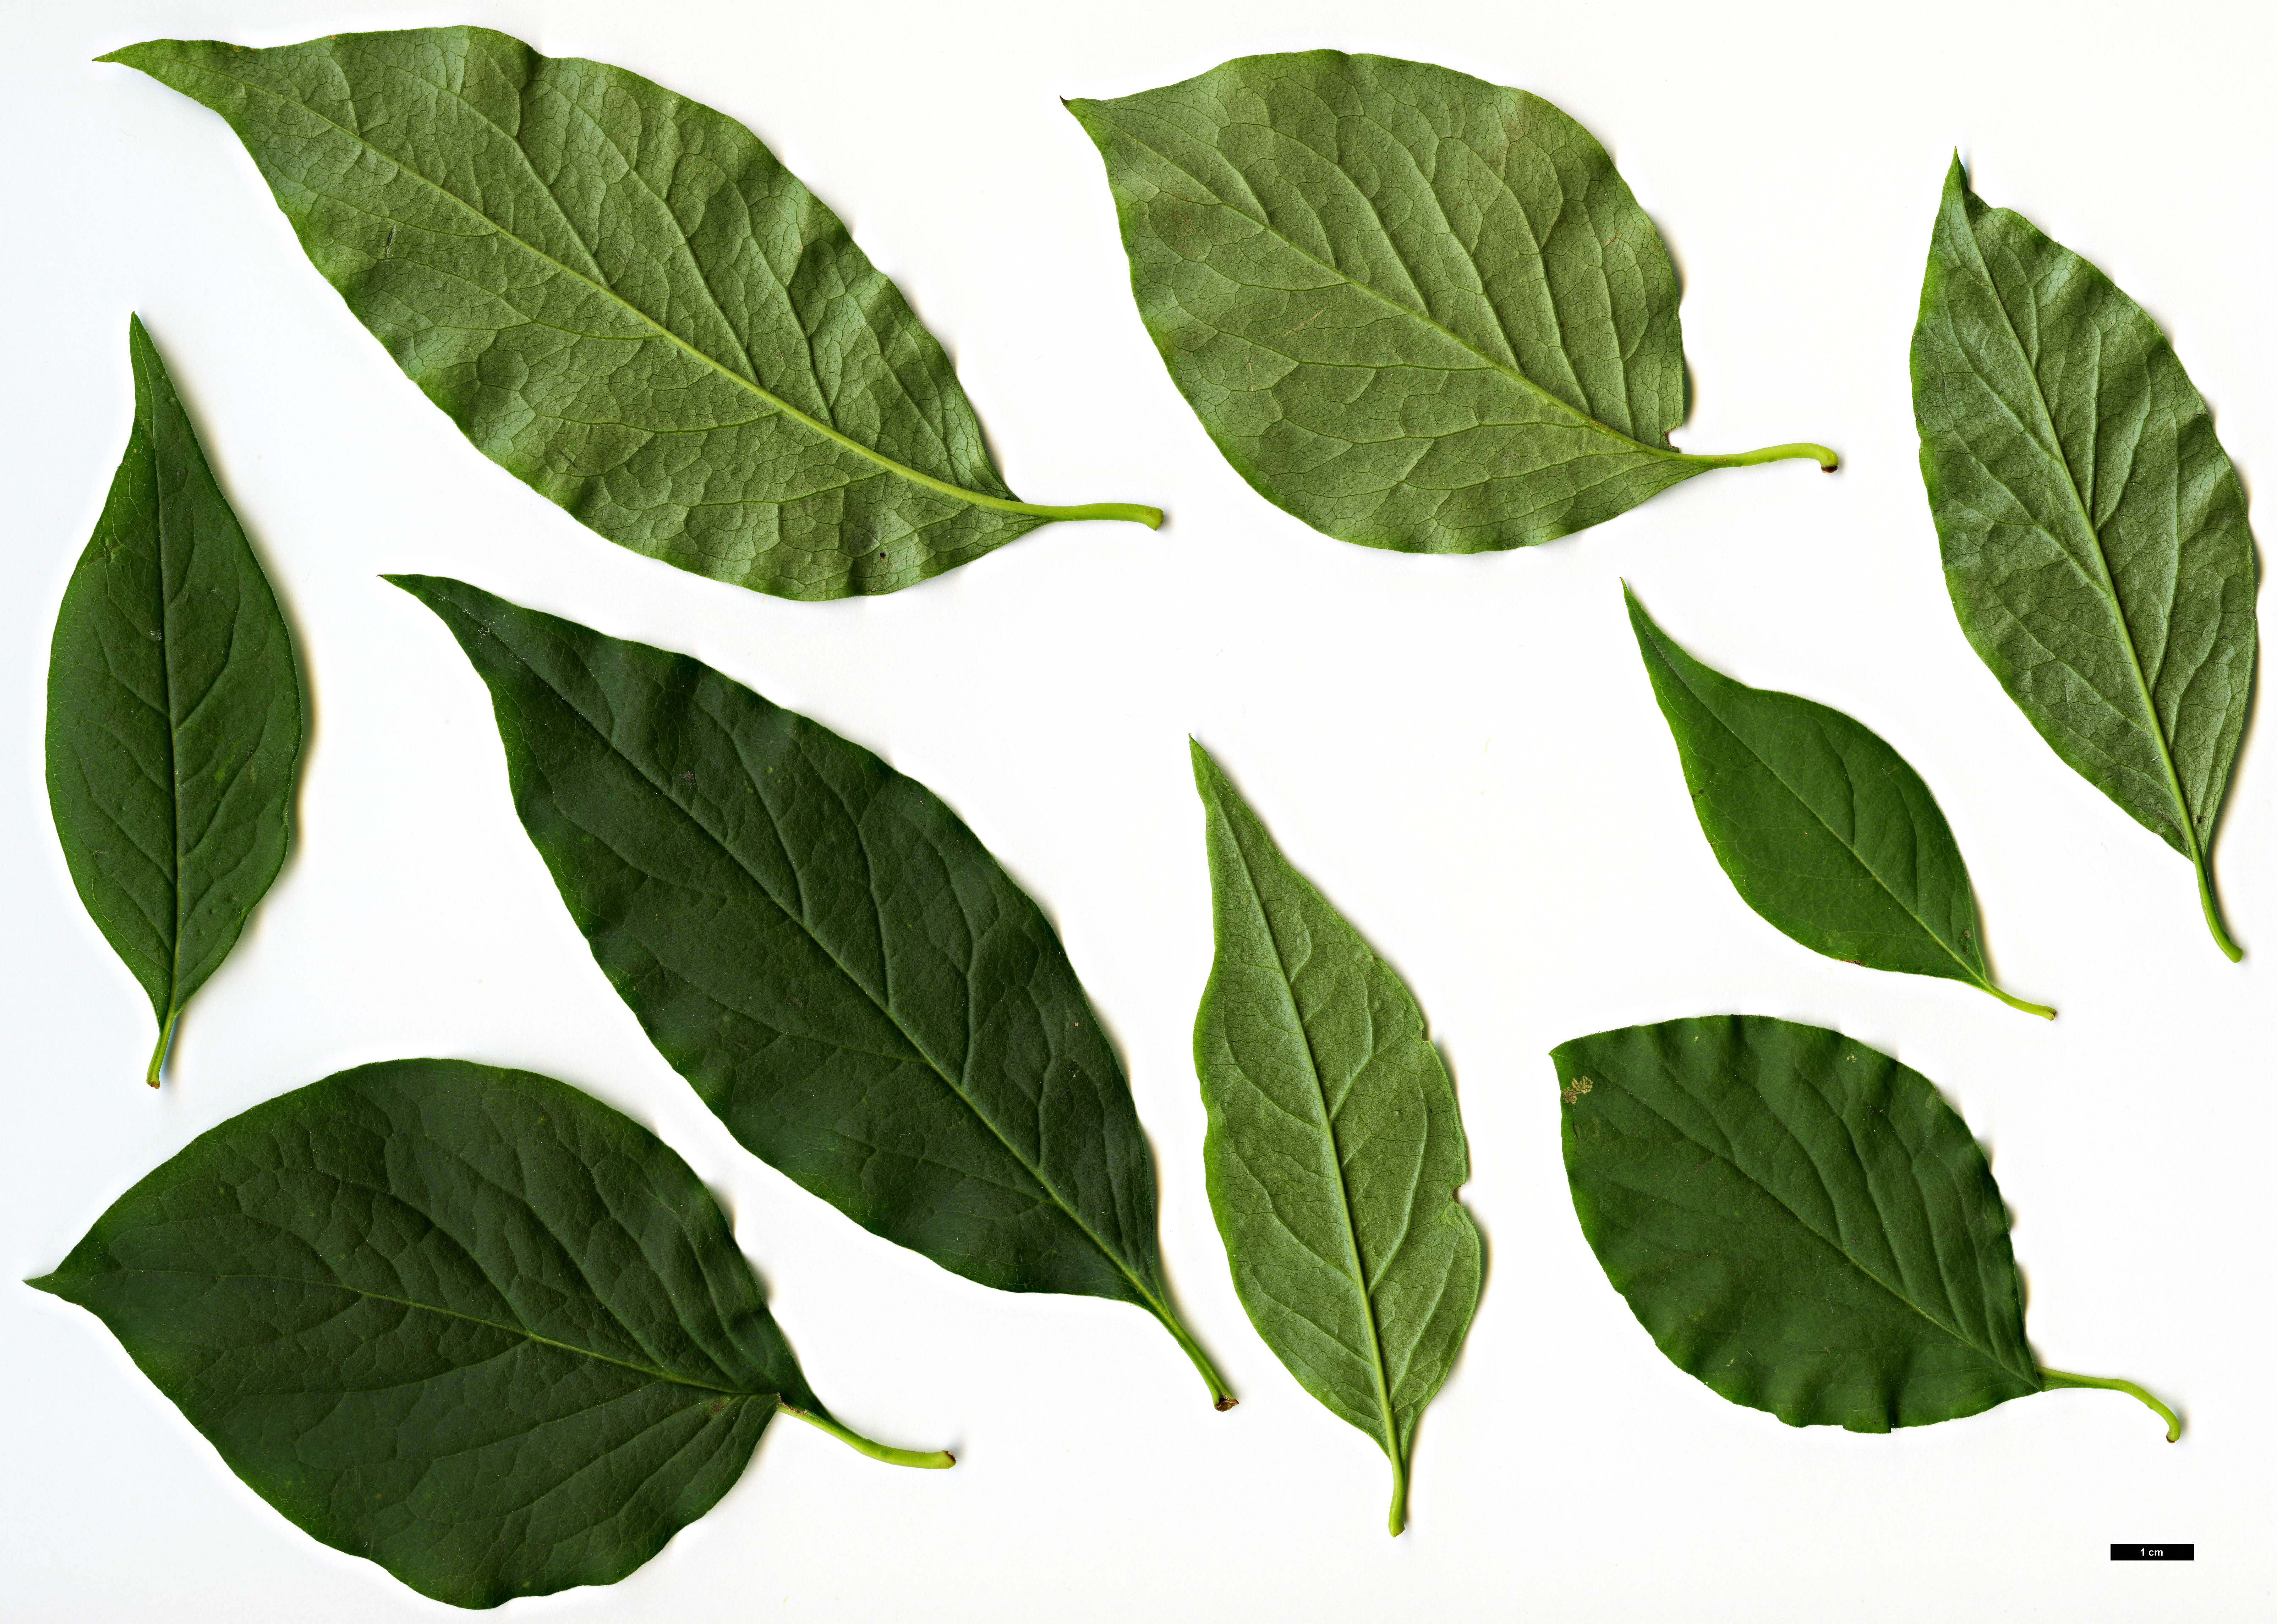 Family Oleaceae Genus Syringa Specy reticulata SpeciesSub